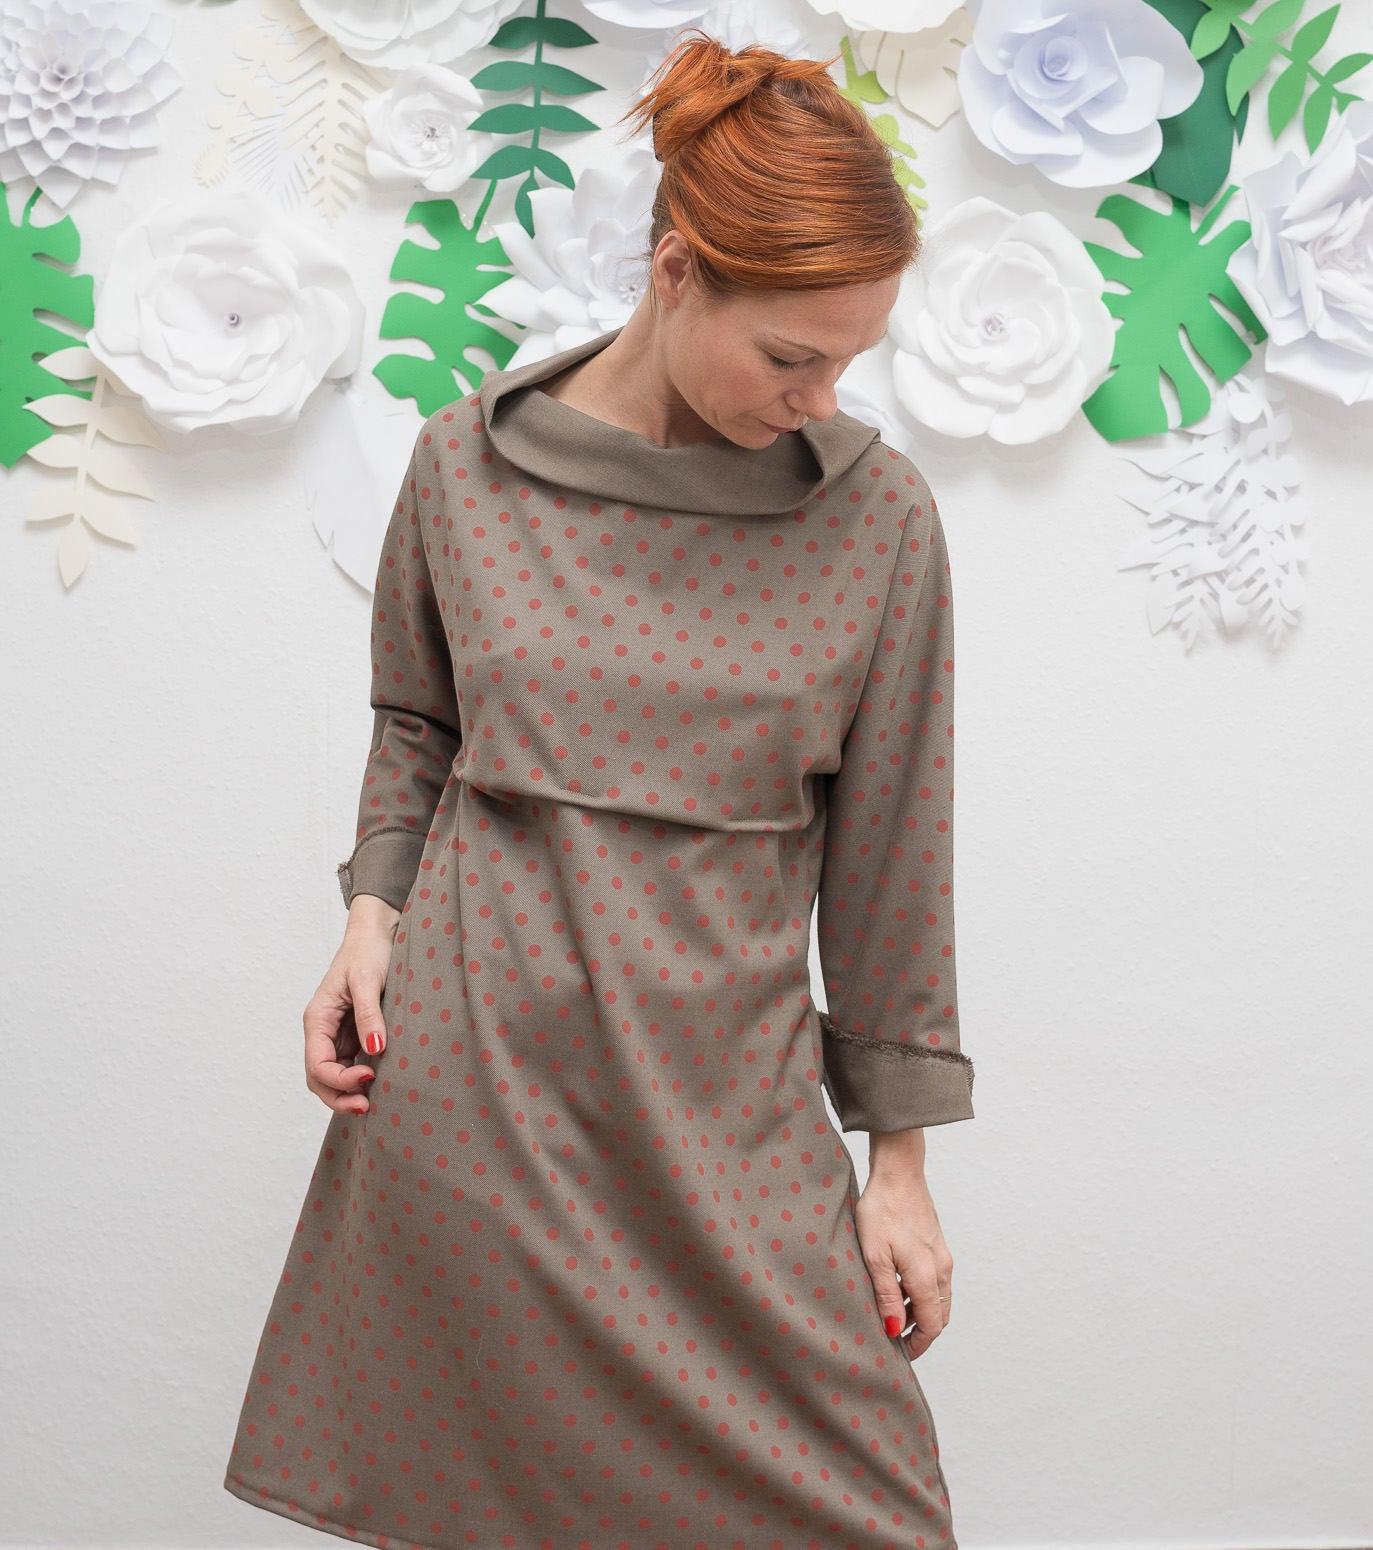 ROTETULPE Winterkleid Kimono Kleid